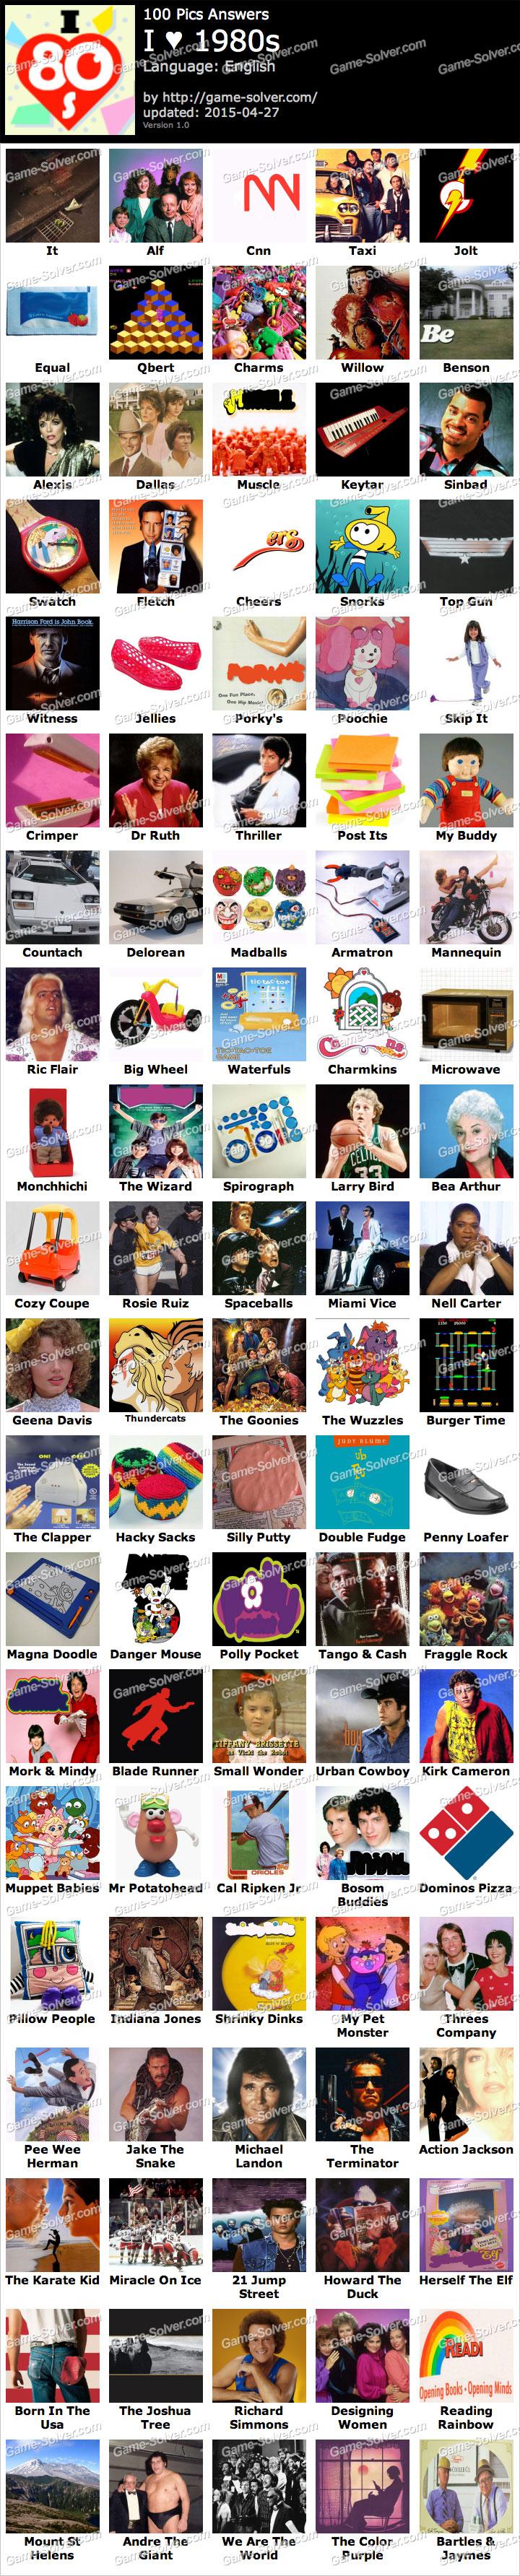 100 Pics Answers i Love 90s 100 Pics i Love 1980s